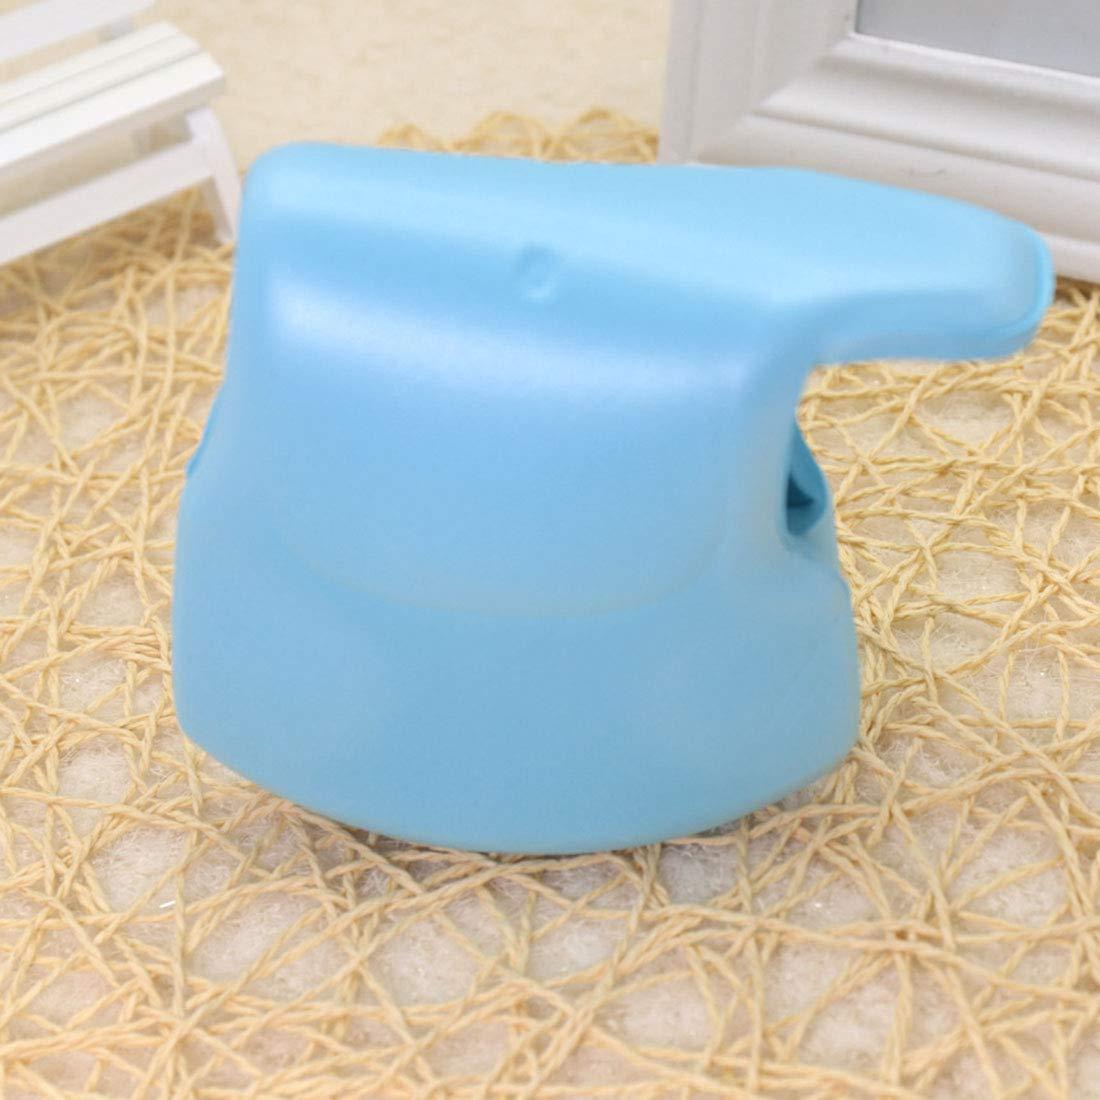 YUENA CARE 2Piece Baby Bath Spout Cover Kids Bathroom Faucet Cover Bath Toy Blue BE813-0006-2-US